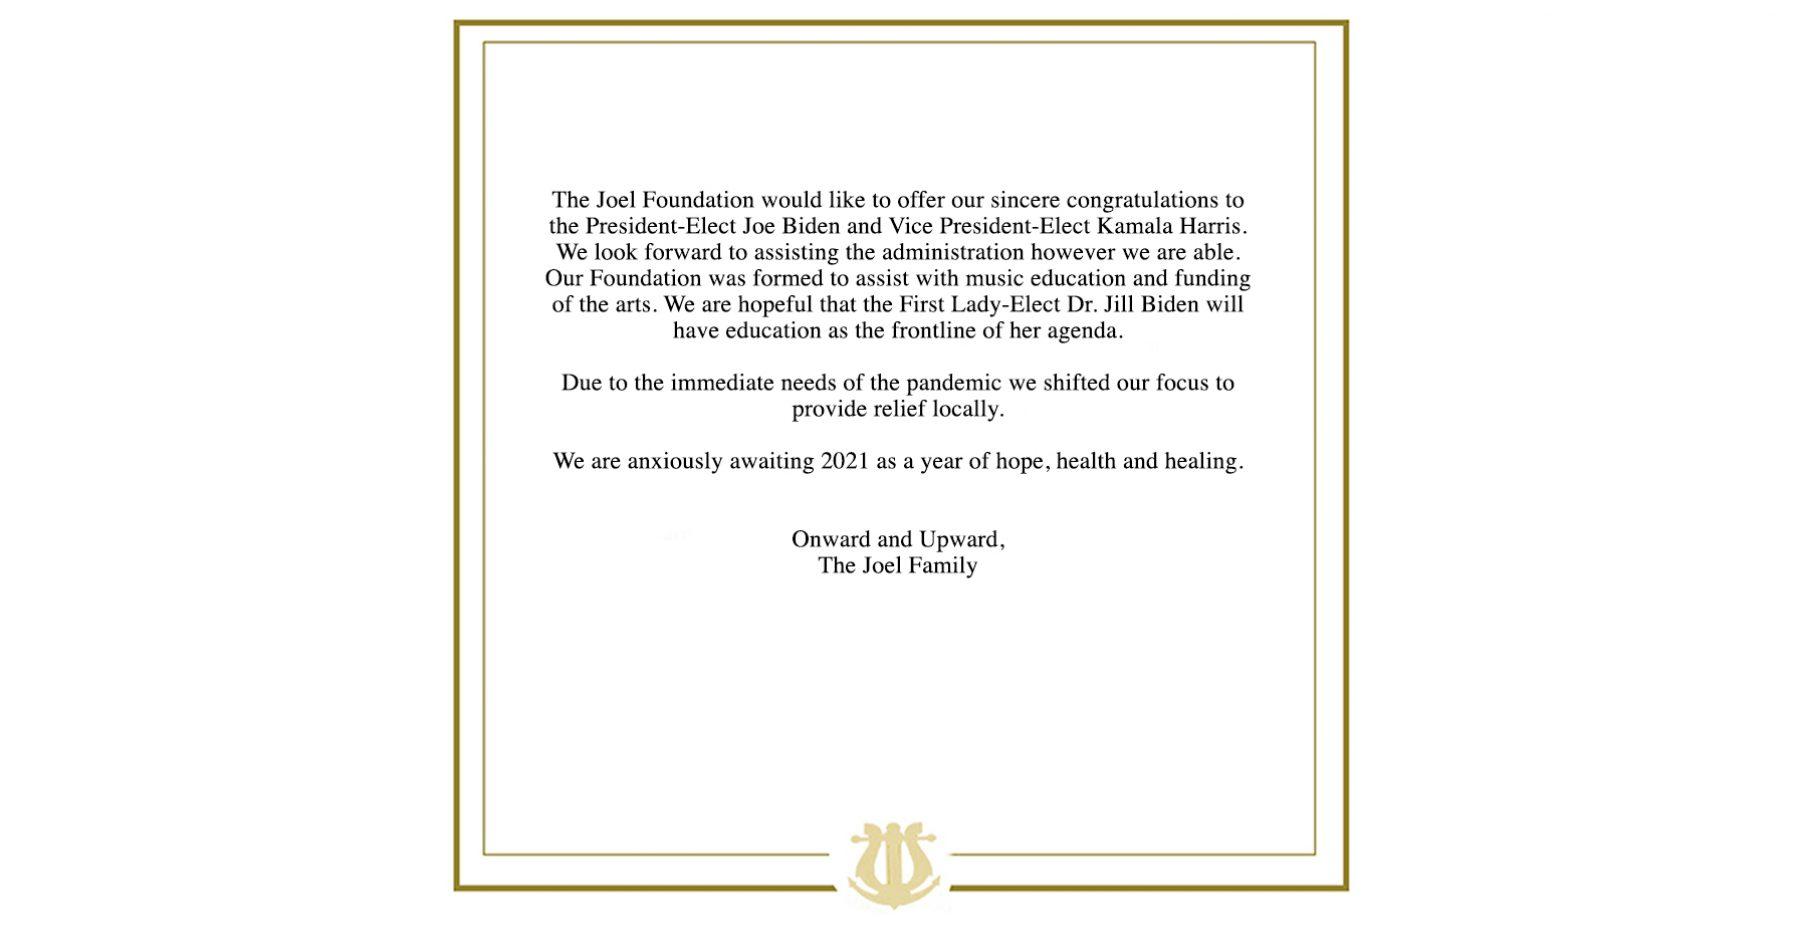 The Joel Foundation congratulates President-Elect Joe Biden and Vice President-Elect Kamala Harris